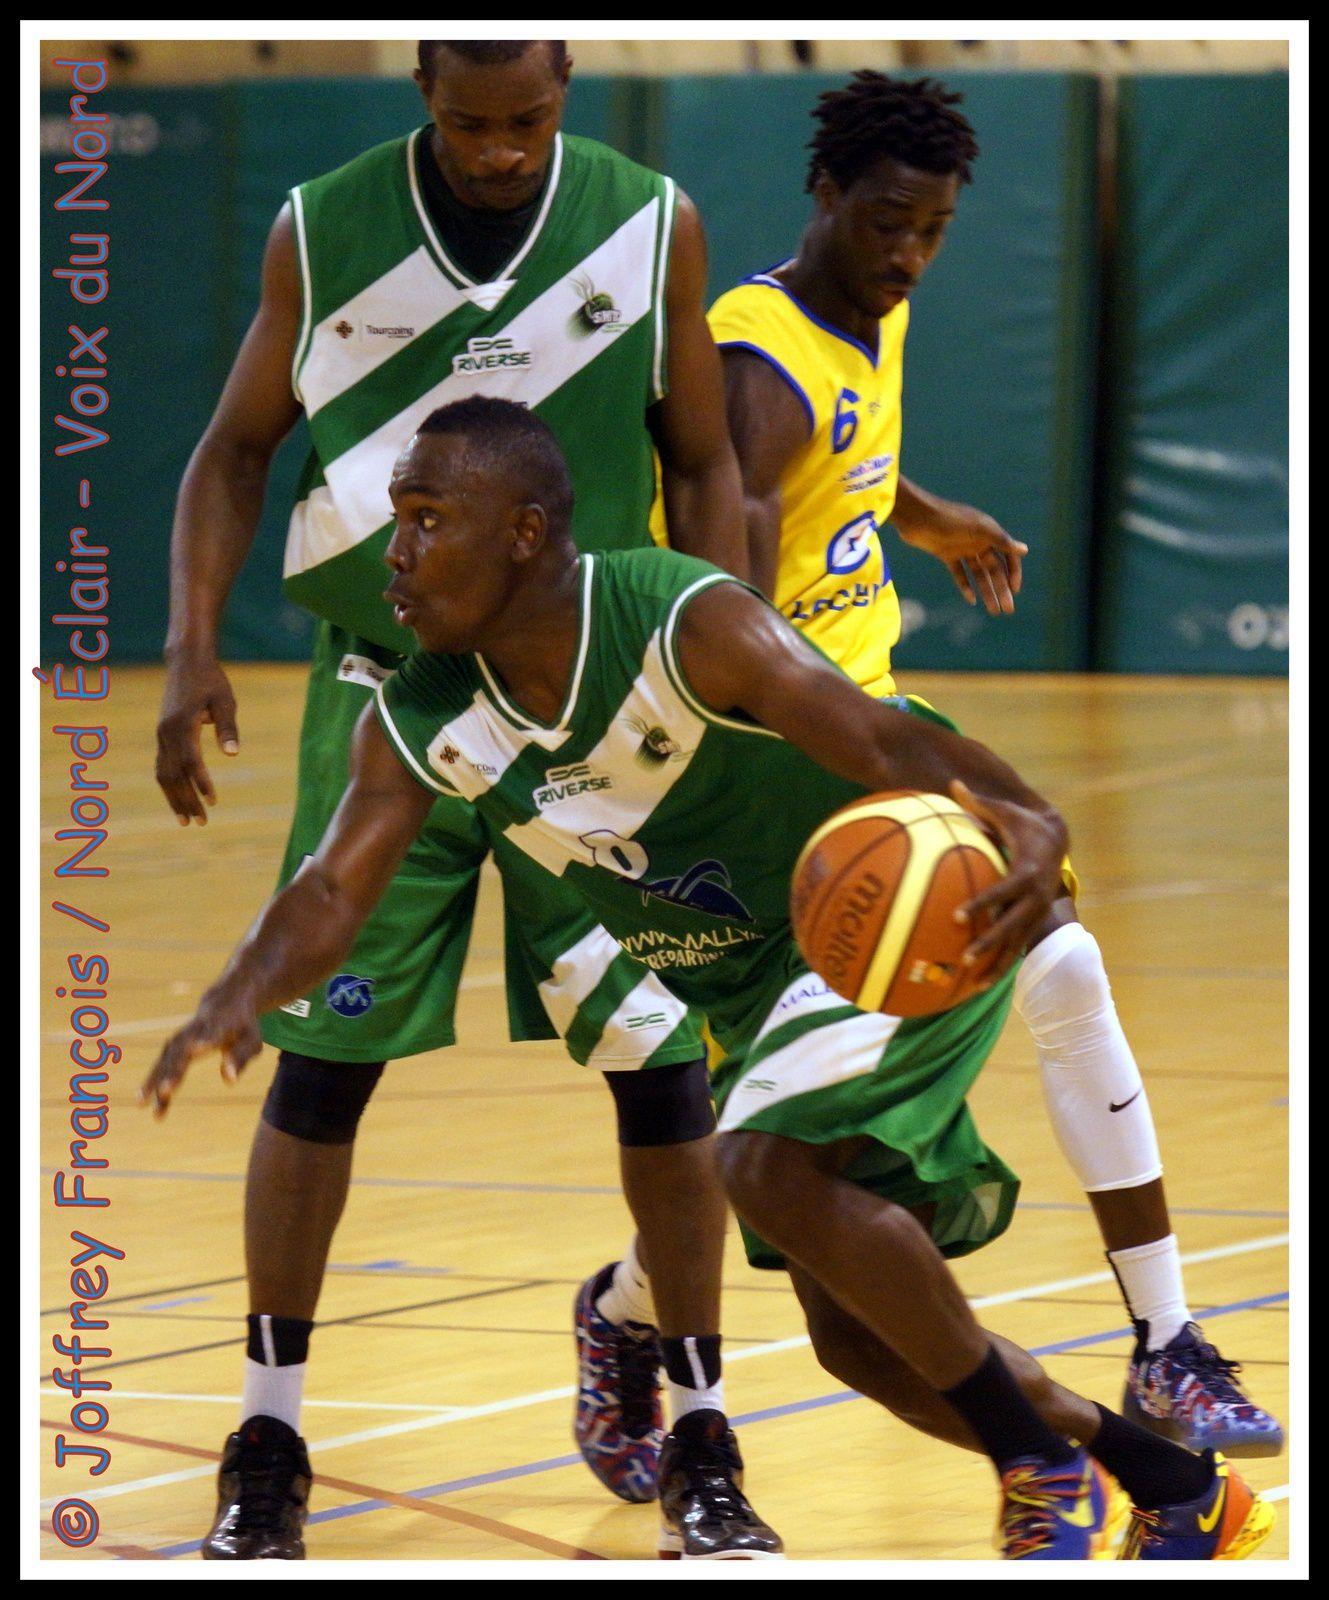 04.10.14 Basket N2 ST Michel - Coulommiers